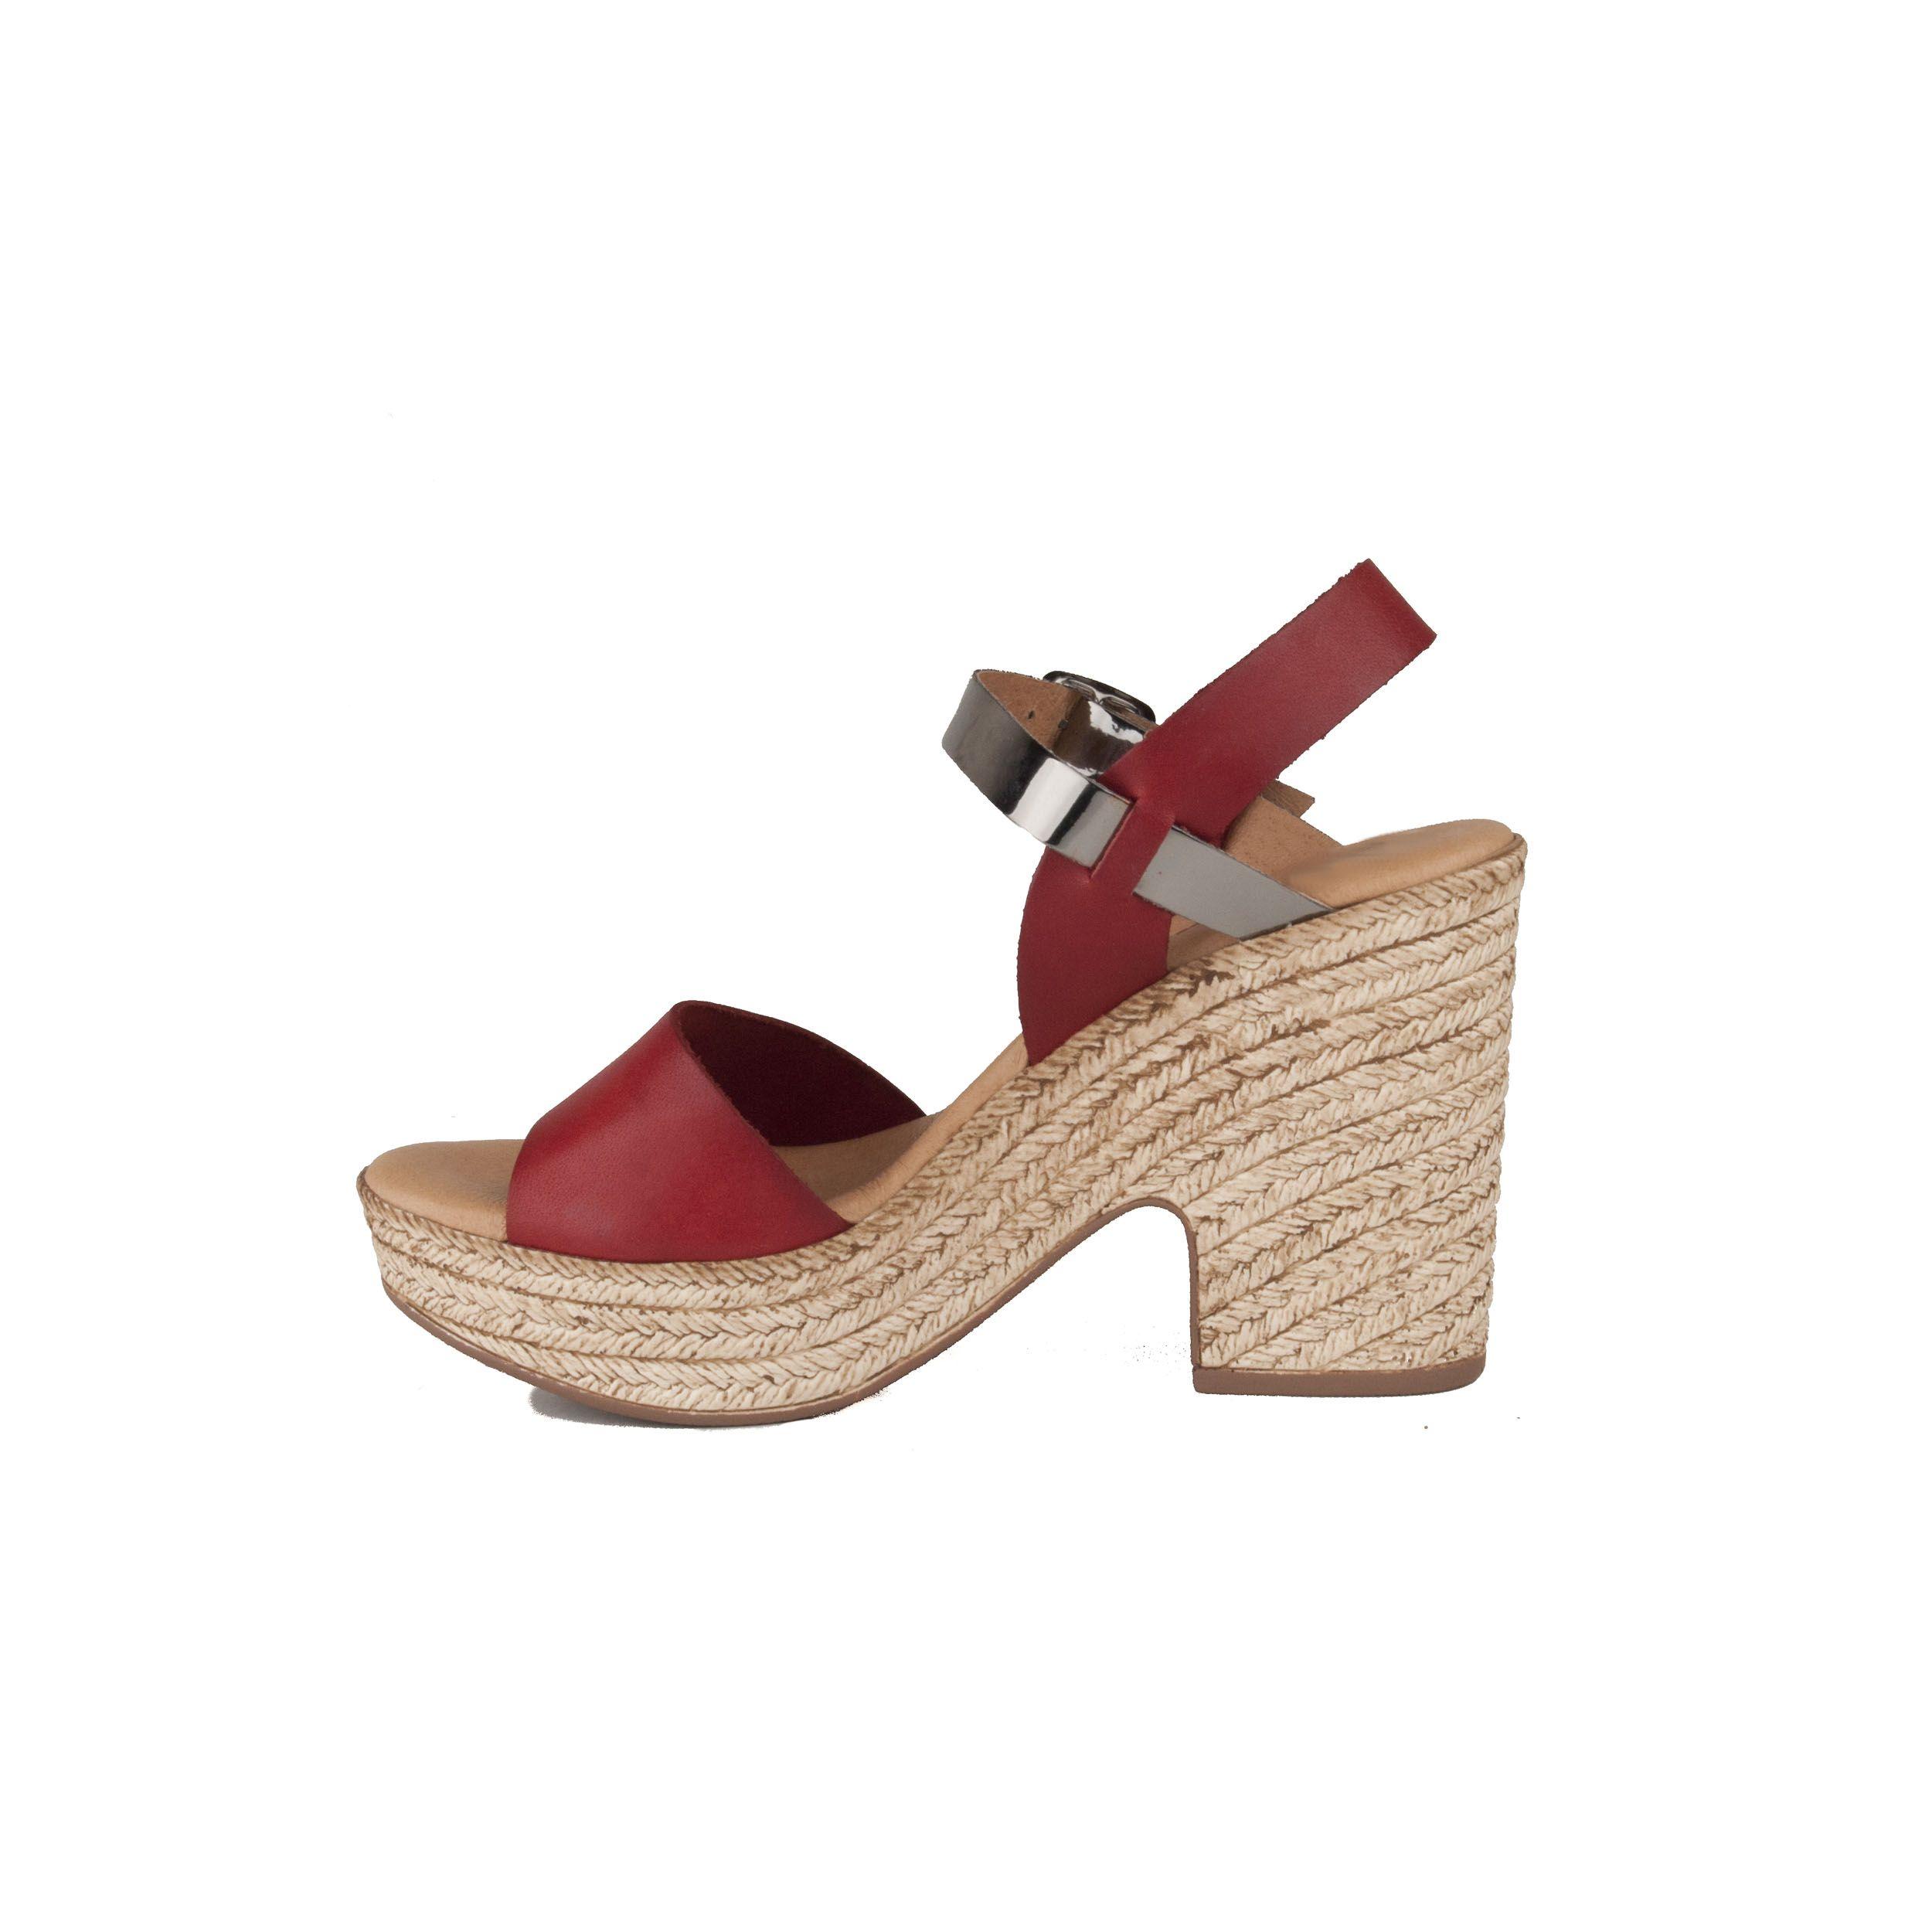 Purapiel Chunky Heel Sandal in Red